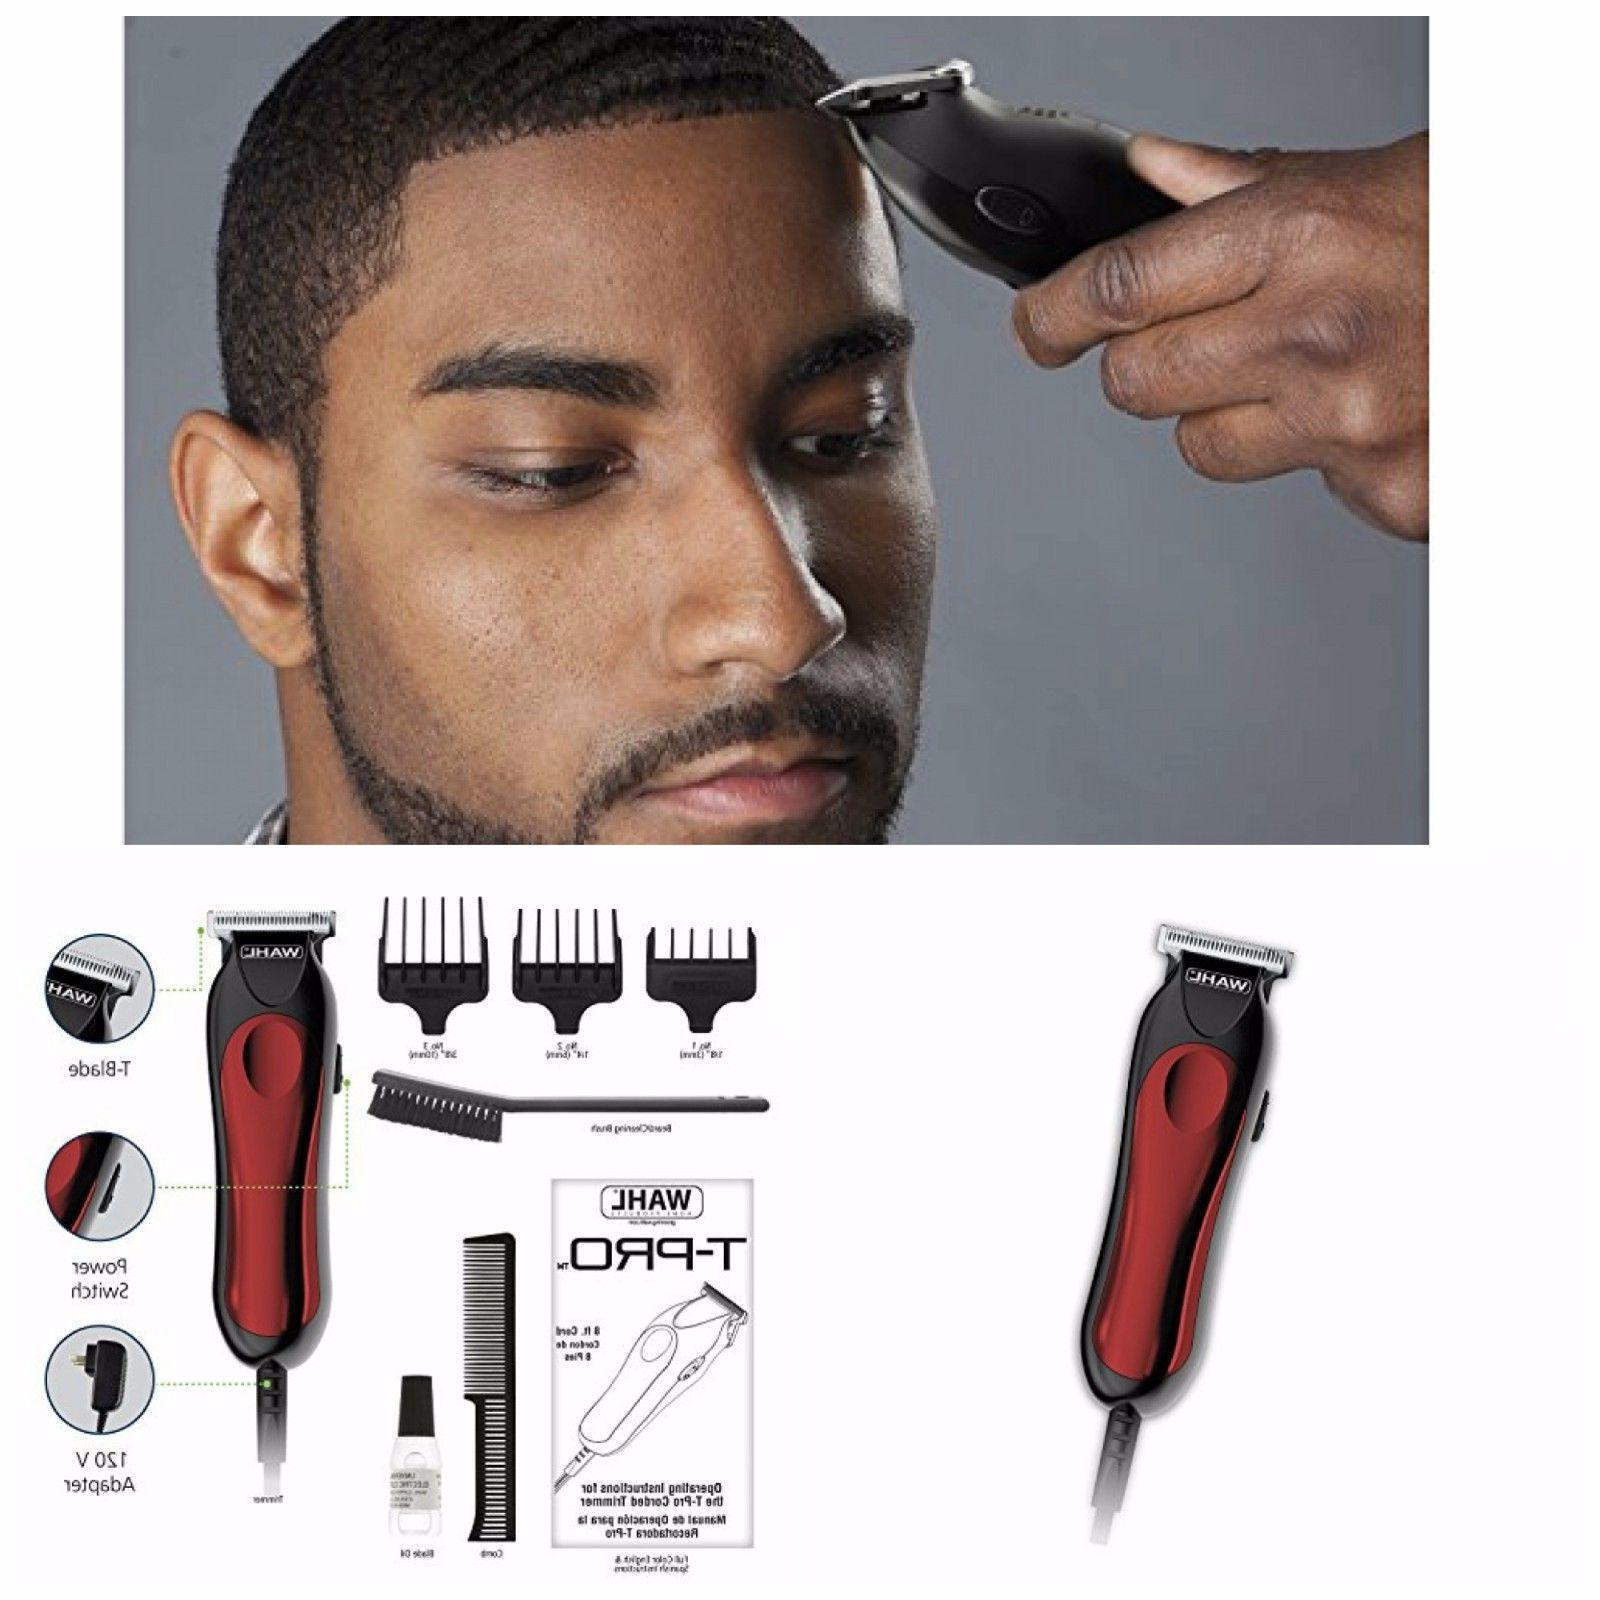 hair trimmer cut clippers